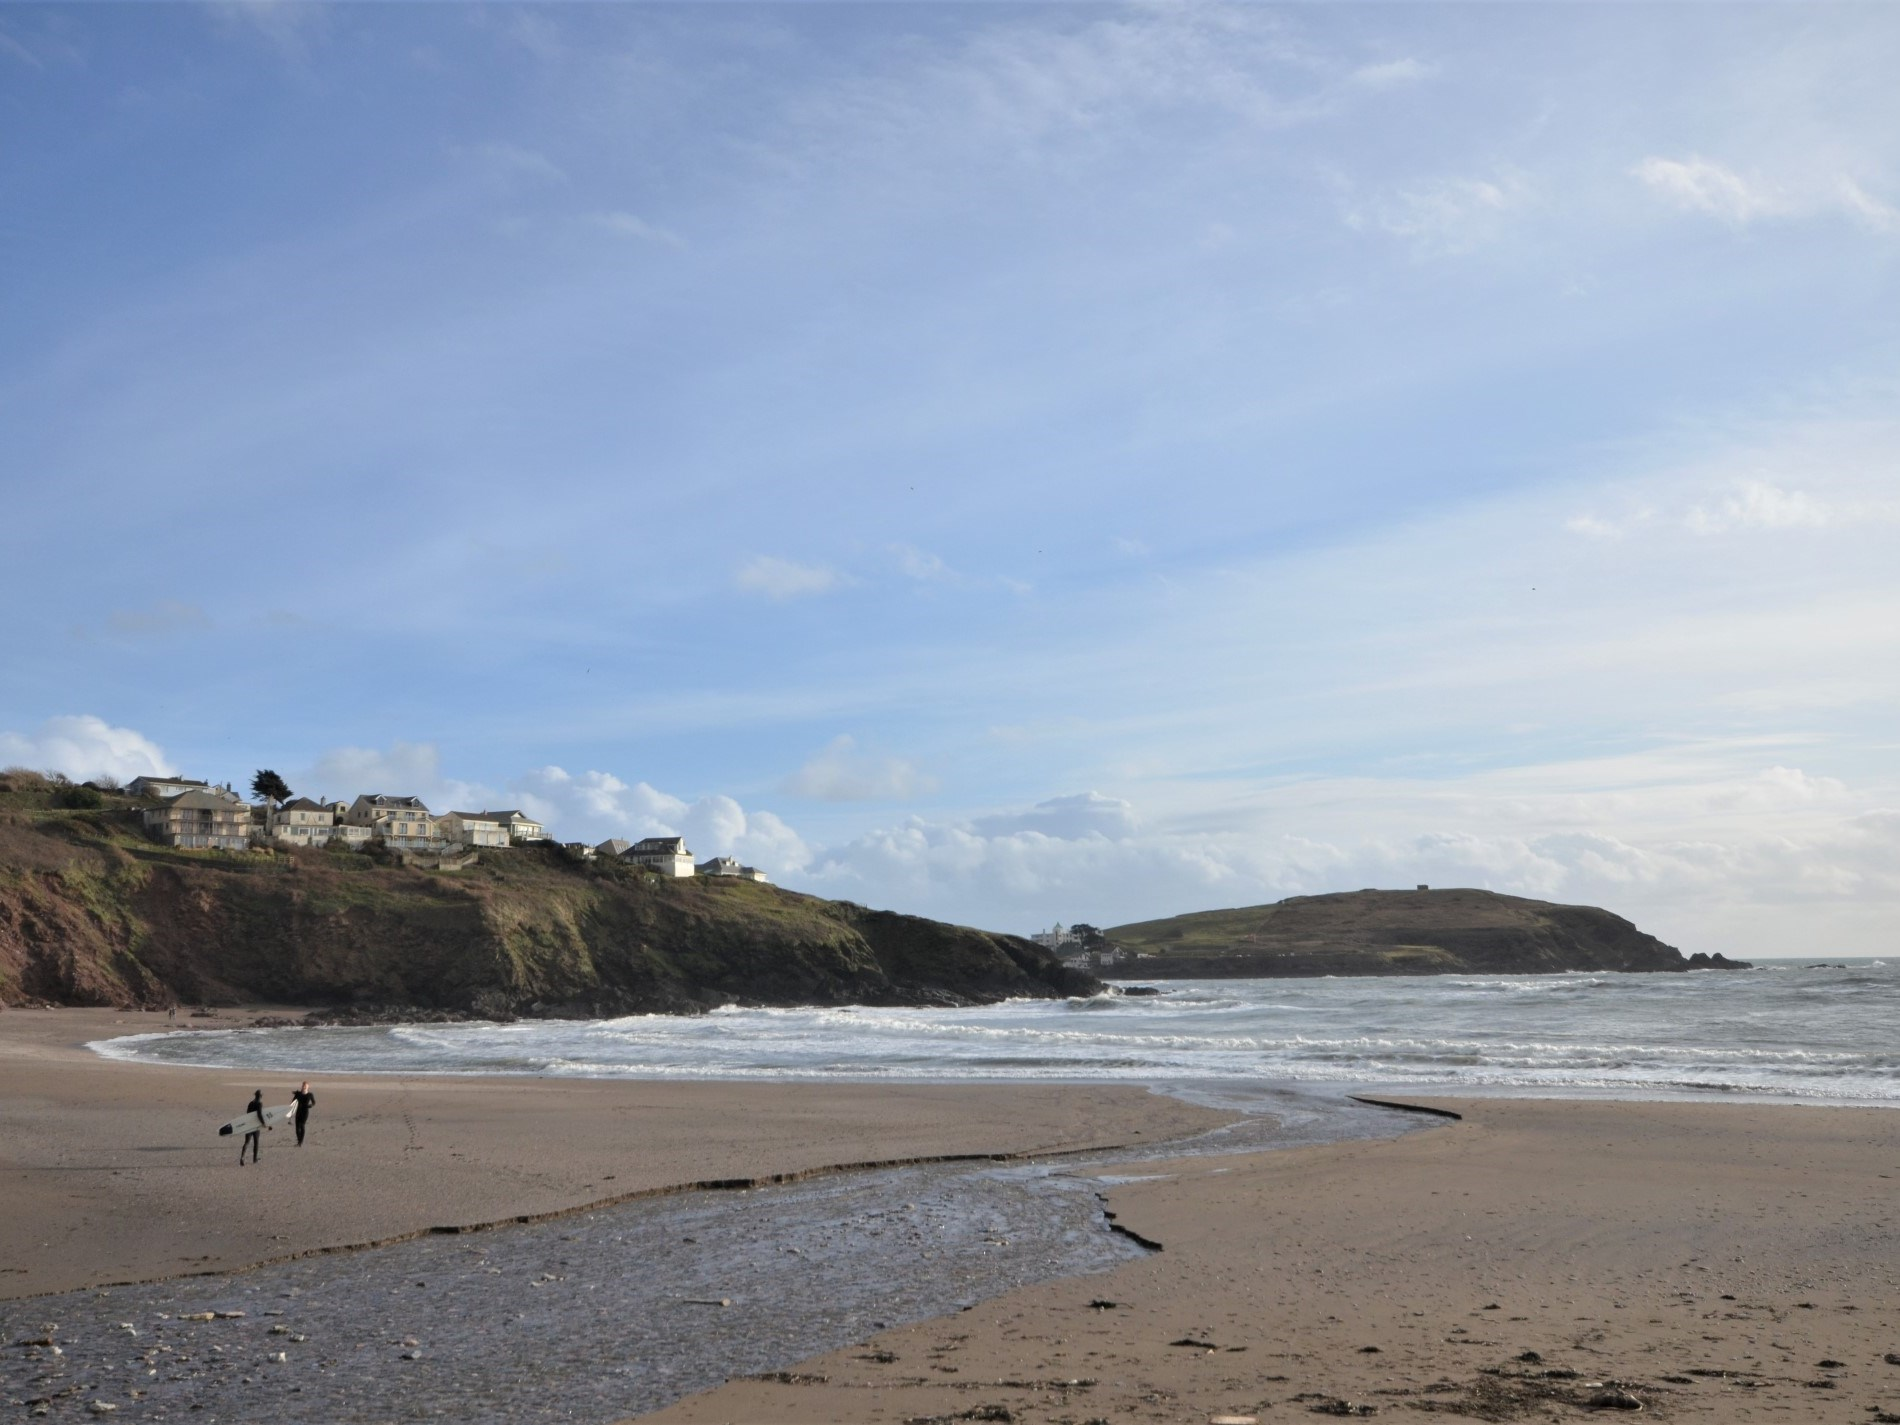 Enjoy a walk Challaborough Bay Beach and enjoy the views to Burgh island